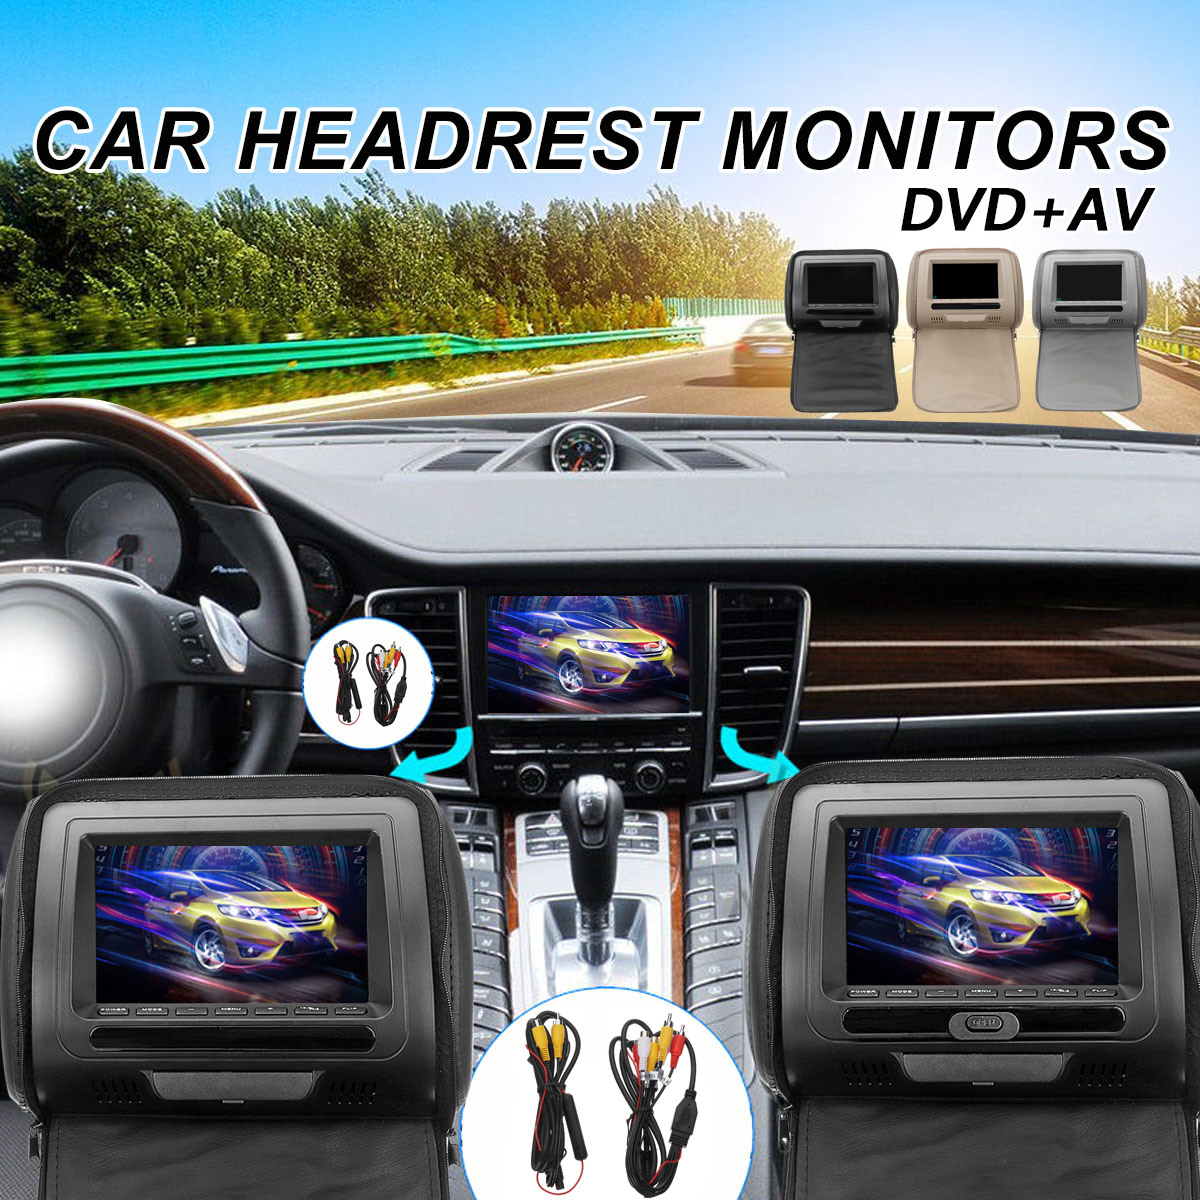 2Pcs/Set 7 Inch Car DVD Headrest Monitor LED Digital Screen Pillow Wireless Remote Control MP5 AV Player  Monitor